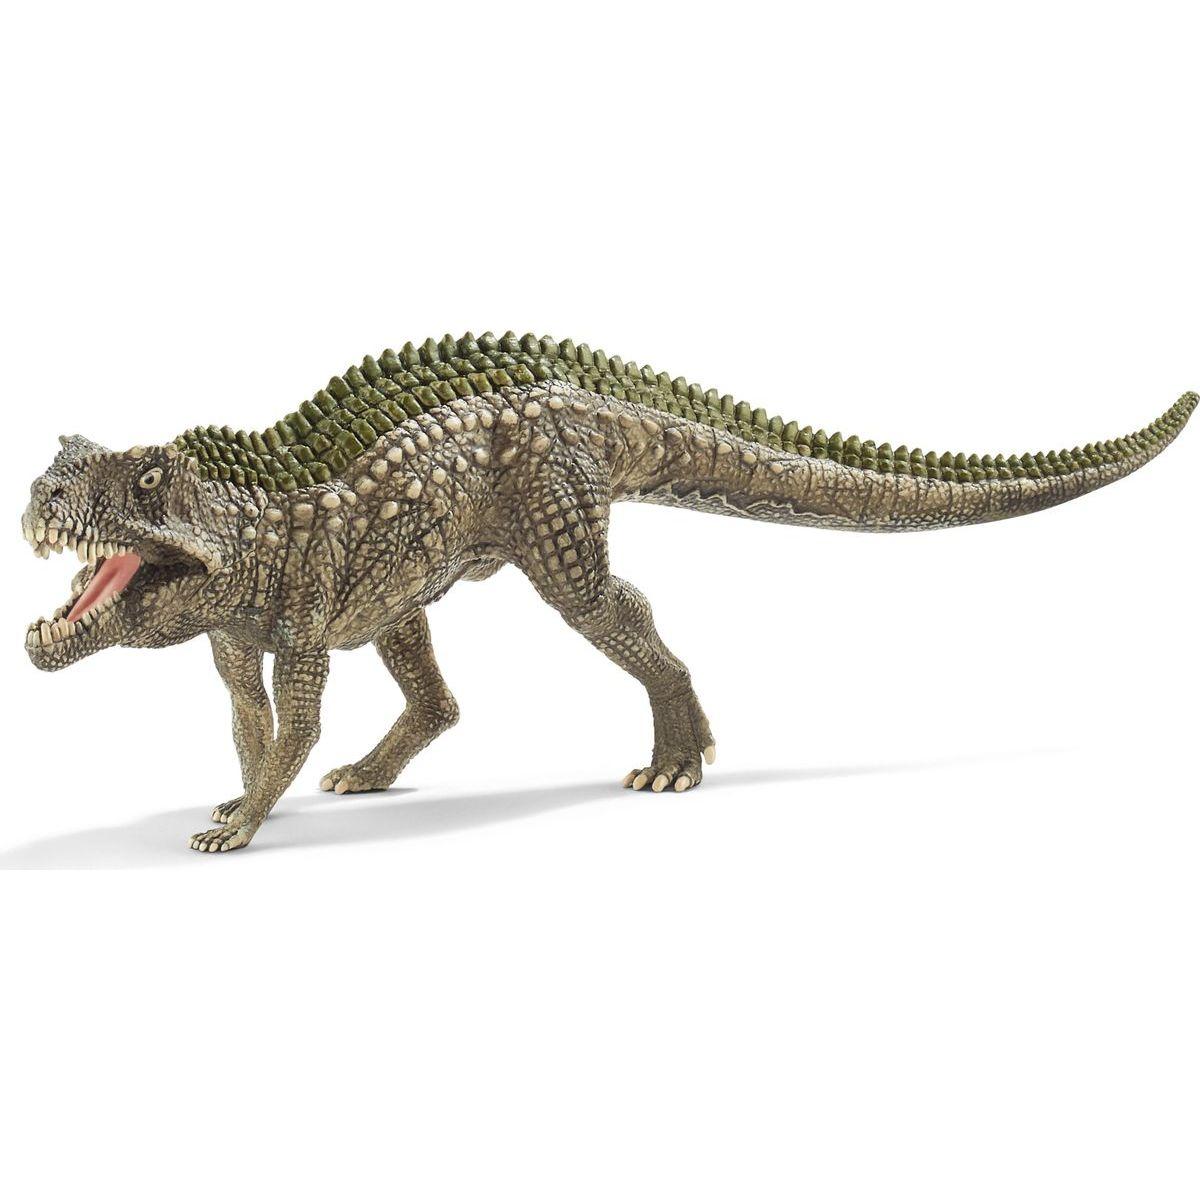 Schleich 15018 Prehistorické zvířátko Postosuchus s pohyblivou čelistí